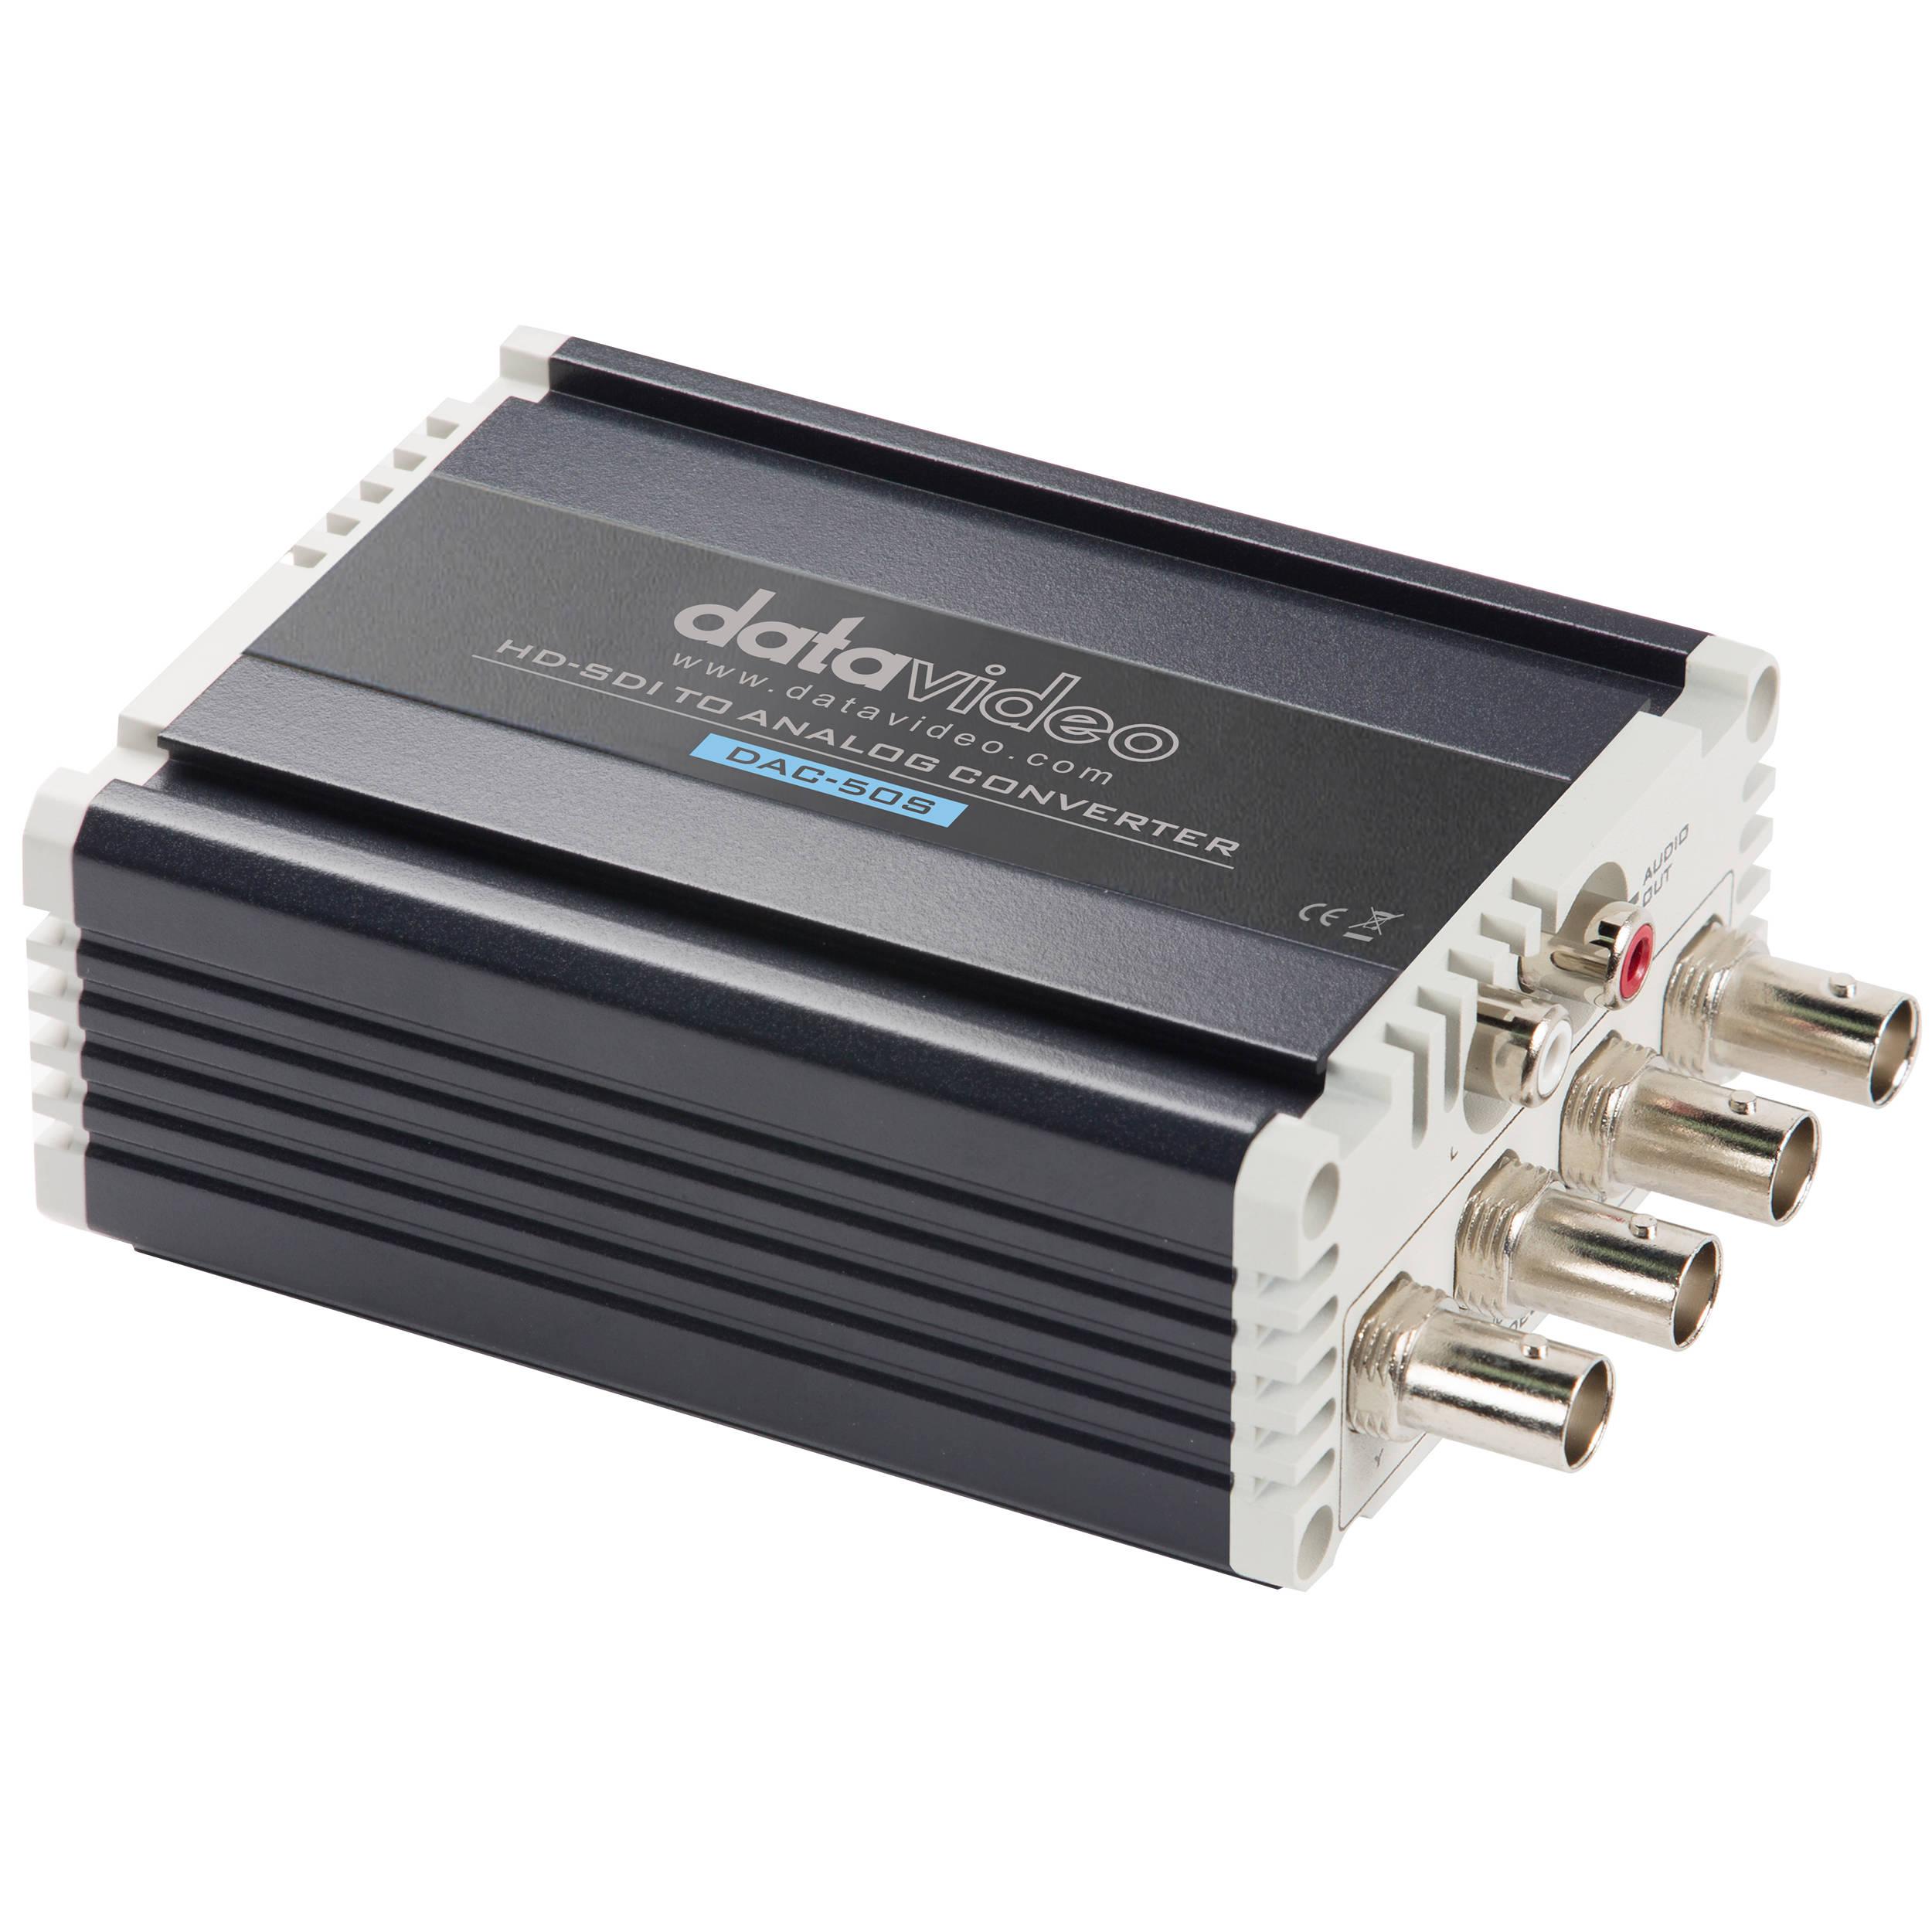 Datavideo Dac 50s Hd Sd Sdi To Analog Converter Bh Rbvhda8 3g Sdsdi 1 Input 8 Output Video Distribution Amplifier